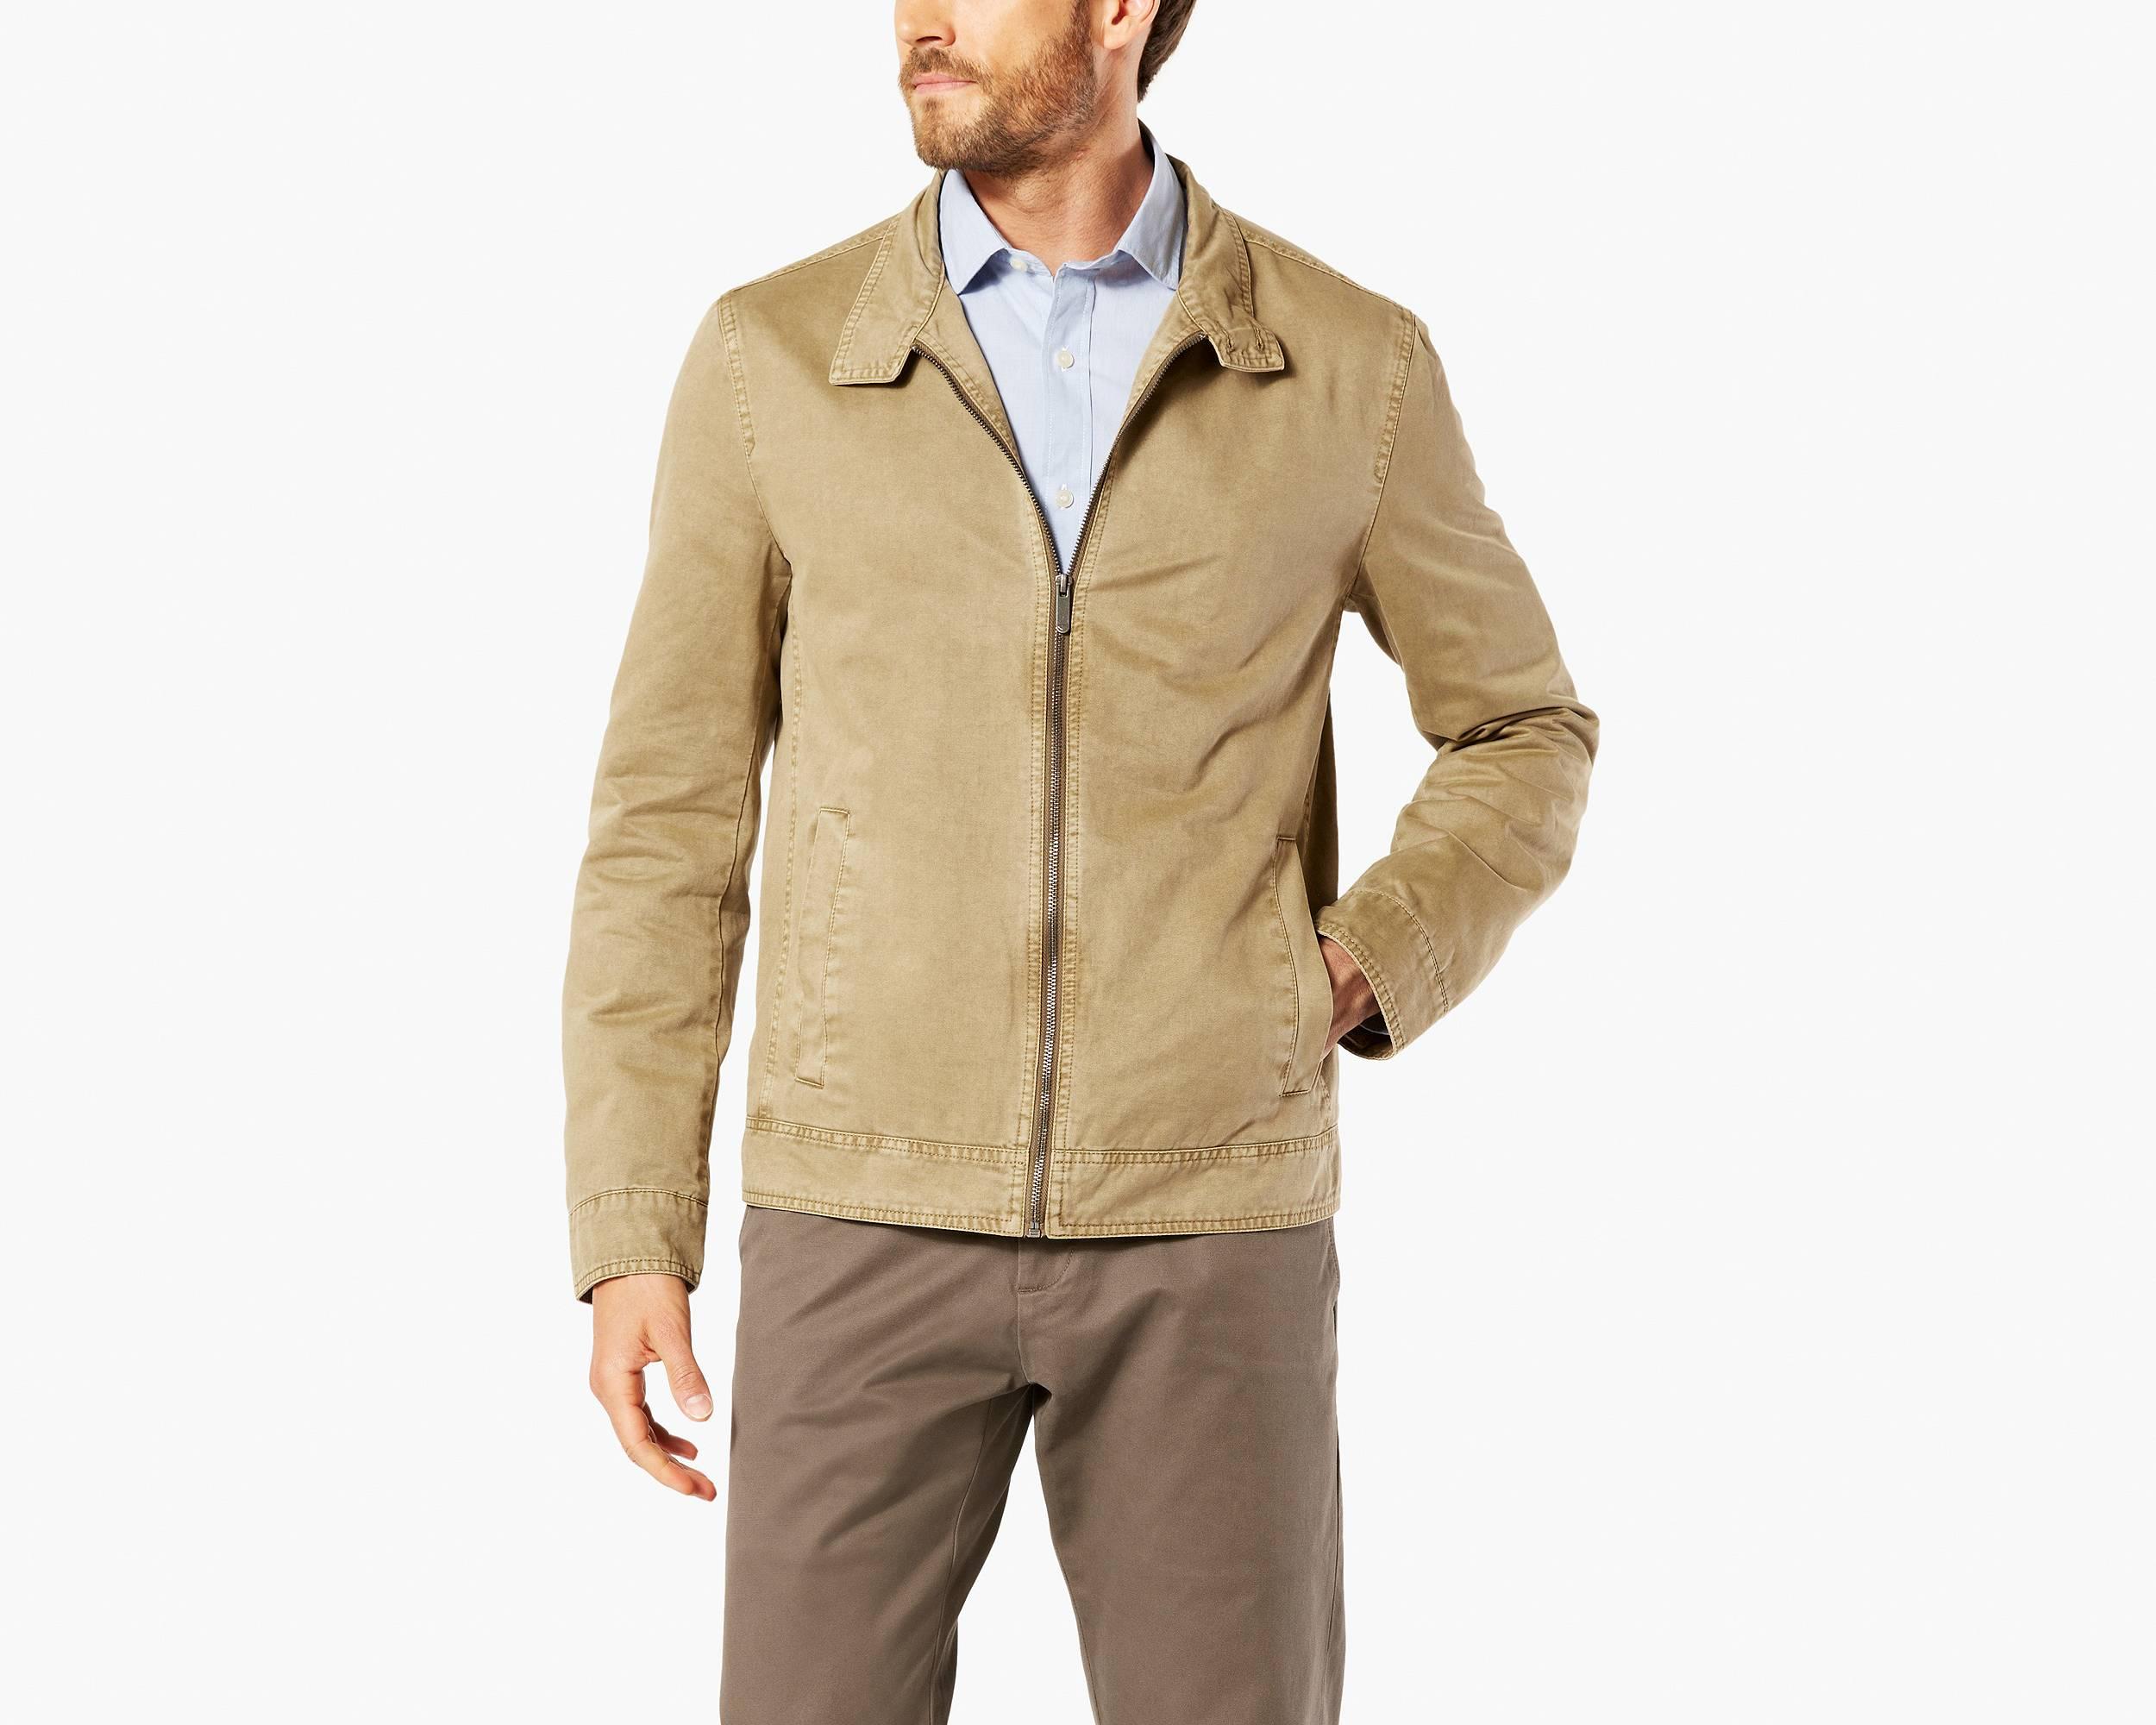 Mens jackets sale - Mens Jackets Sale 30